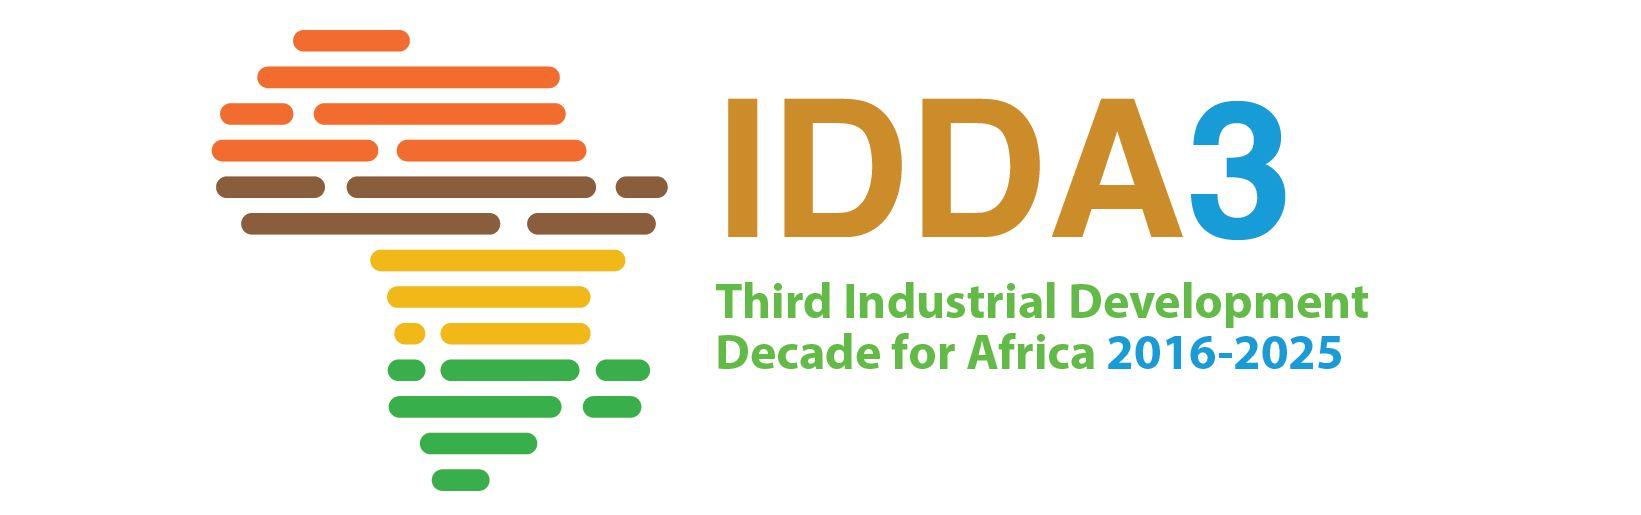 IDDA3_logo_web